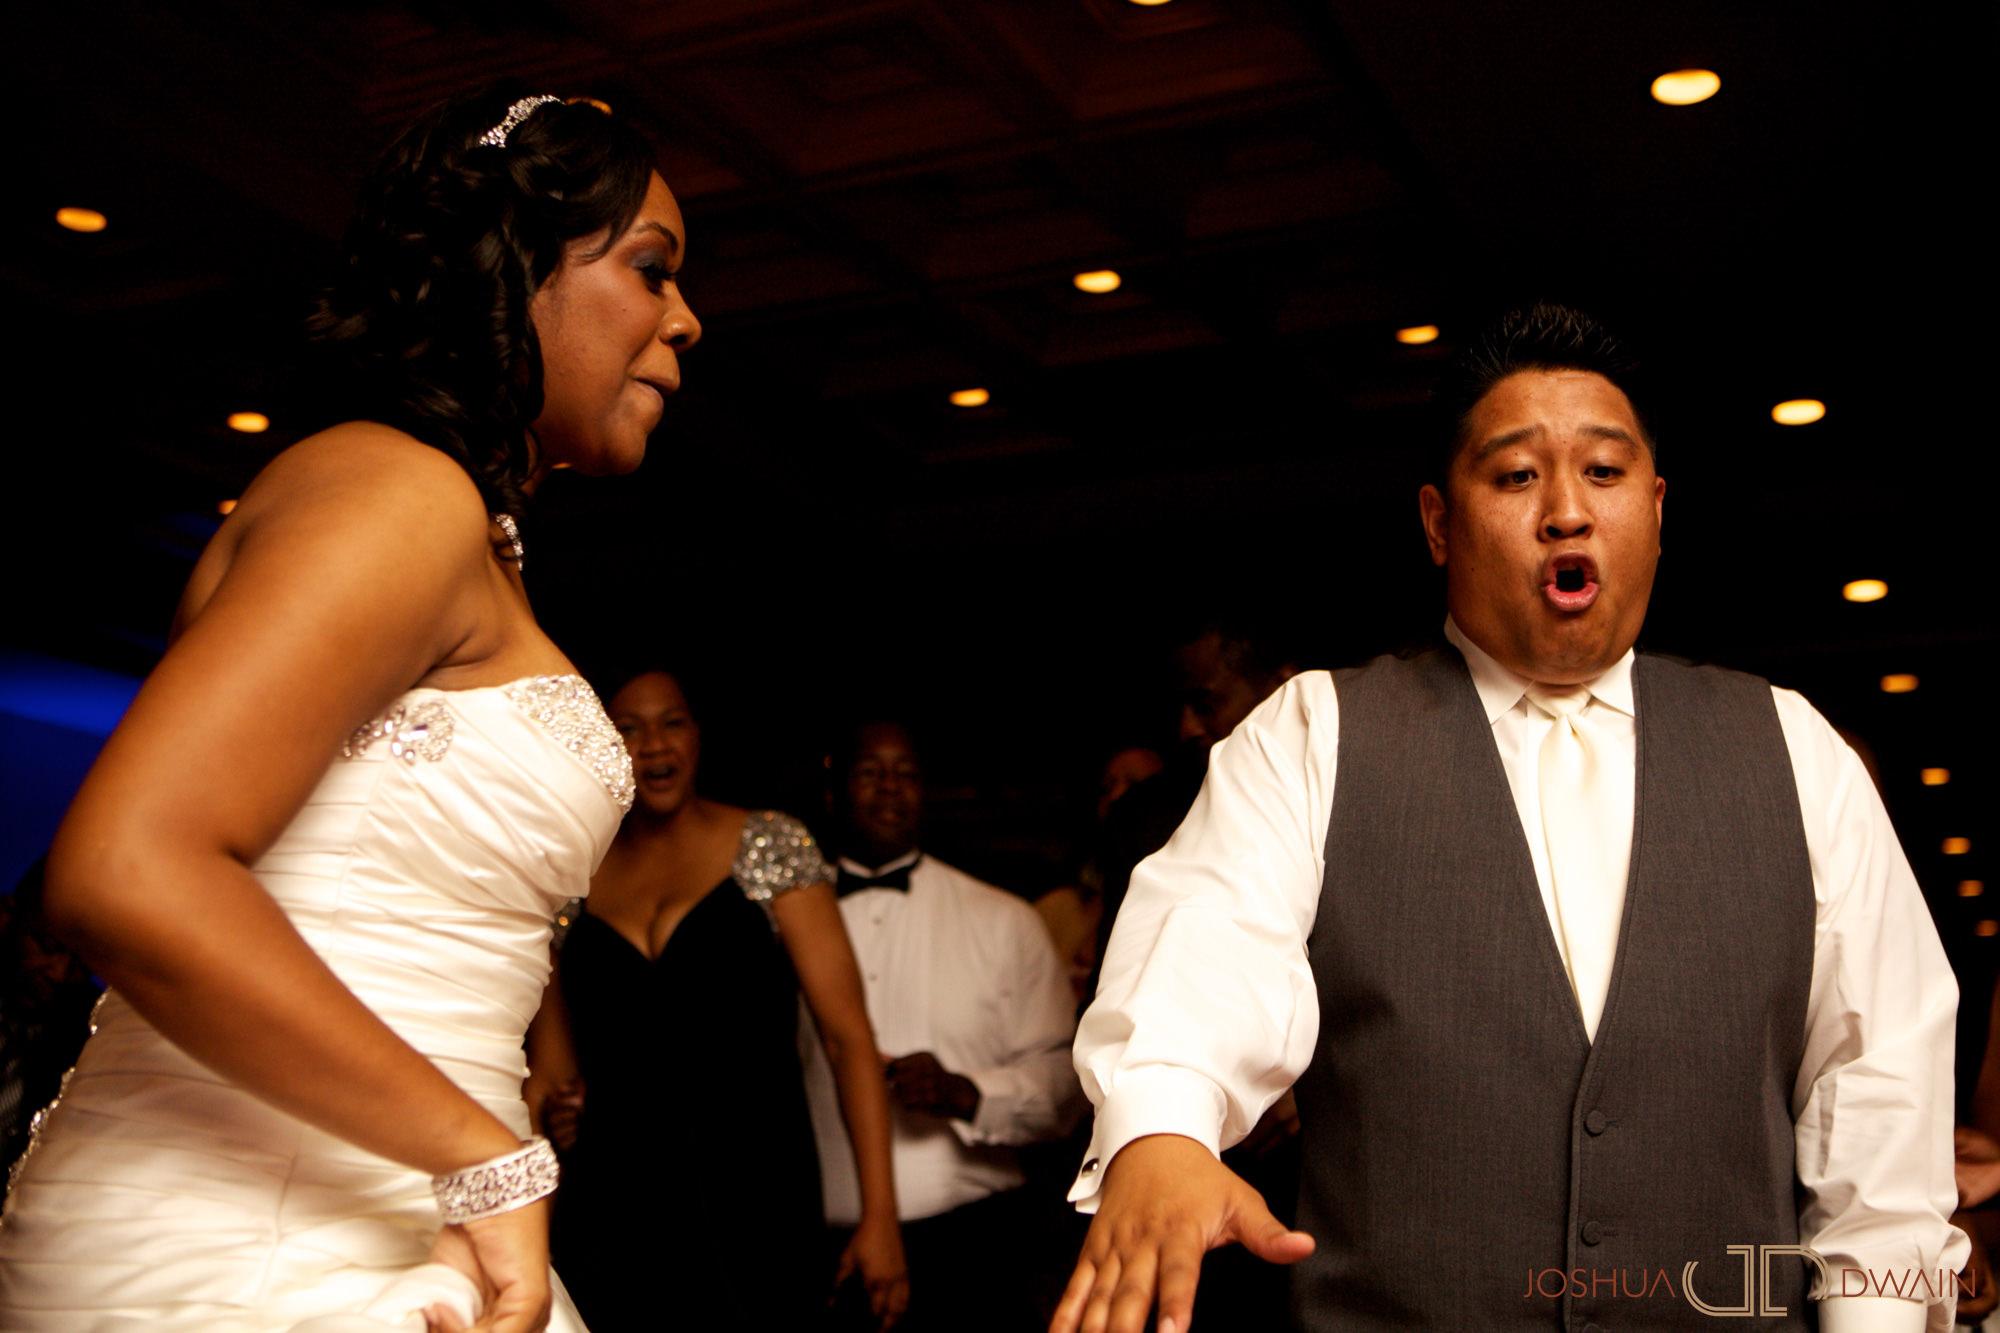 danielle-derek-018-the-imperia-somerset-new-jersey-wedding-photographer-joshua-dwain-danielle-derek-028-the-imperia-somerset-new-jerseywedding-photographer-joshua-dwain-2012-09-15_dd_552